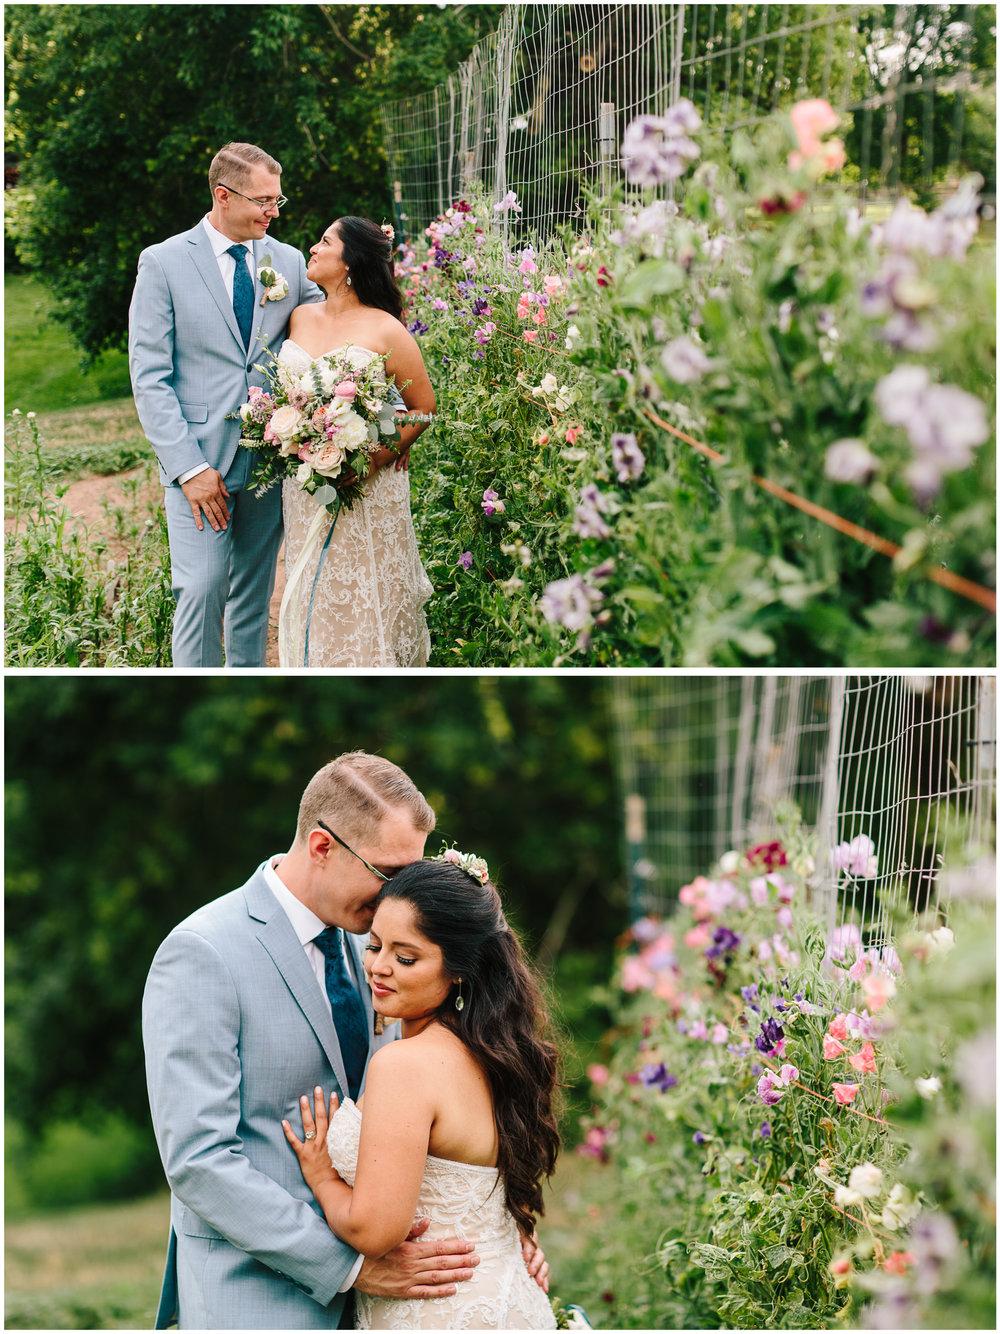 lyons_farmette_wedding_48.jpg